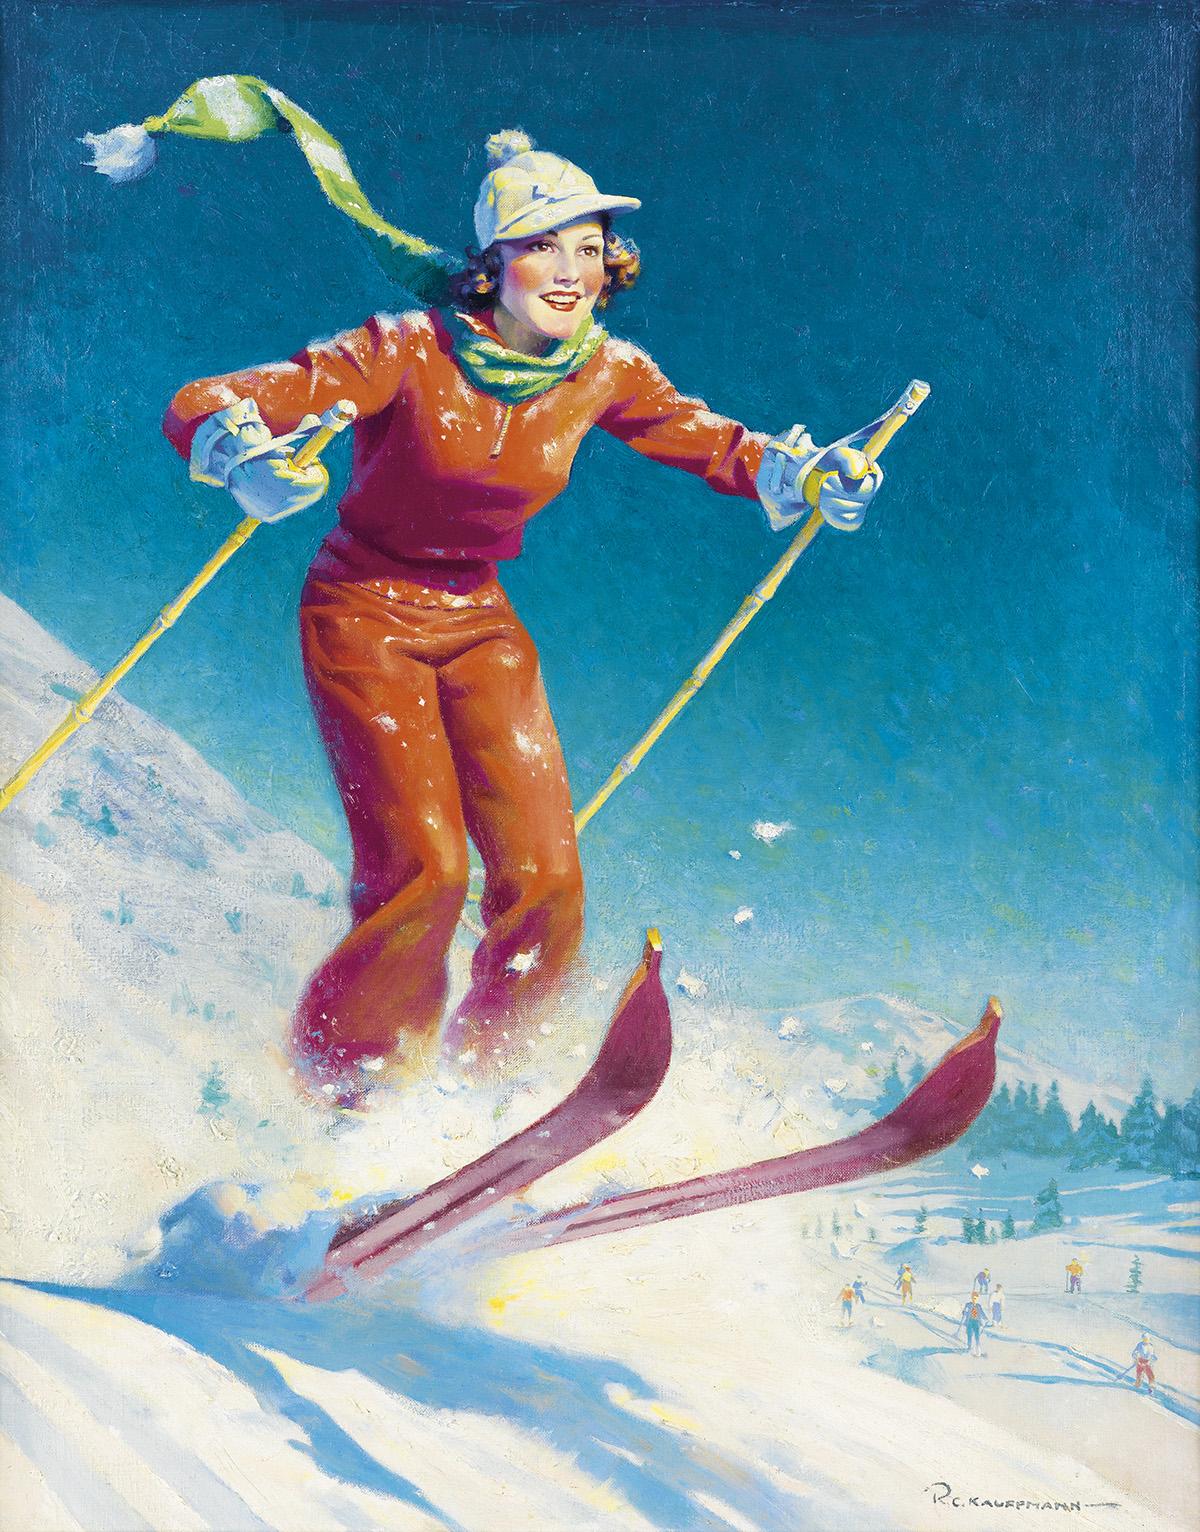 ROBERT KAUFFMANN. Hitting the slopes.